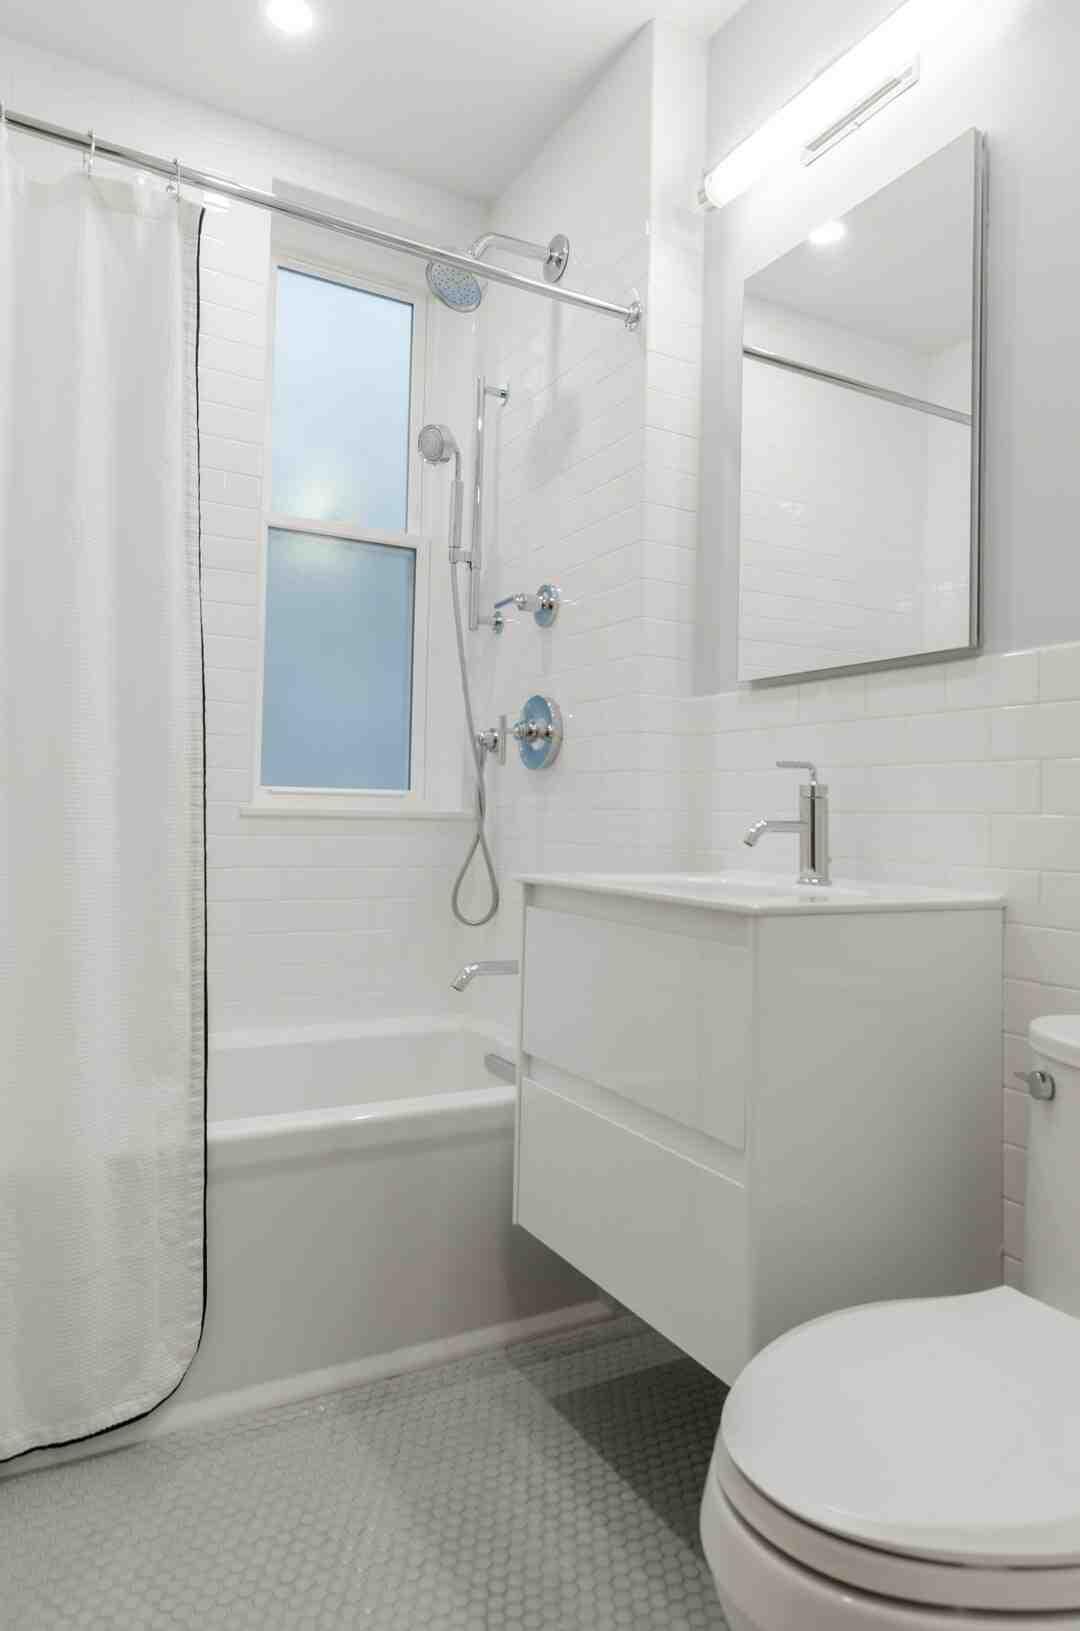 Carrelage salle de bain pierre